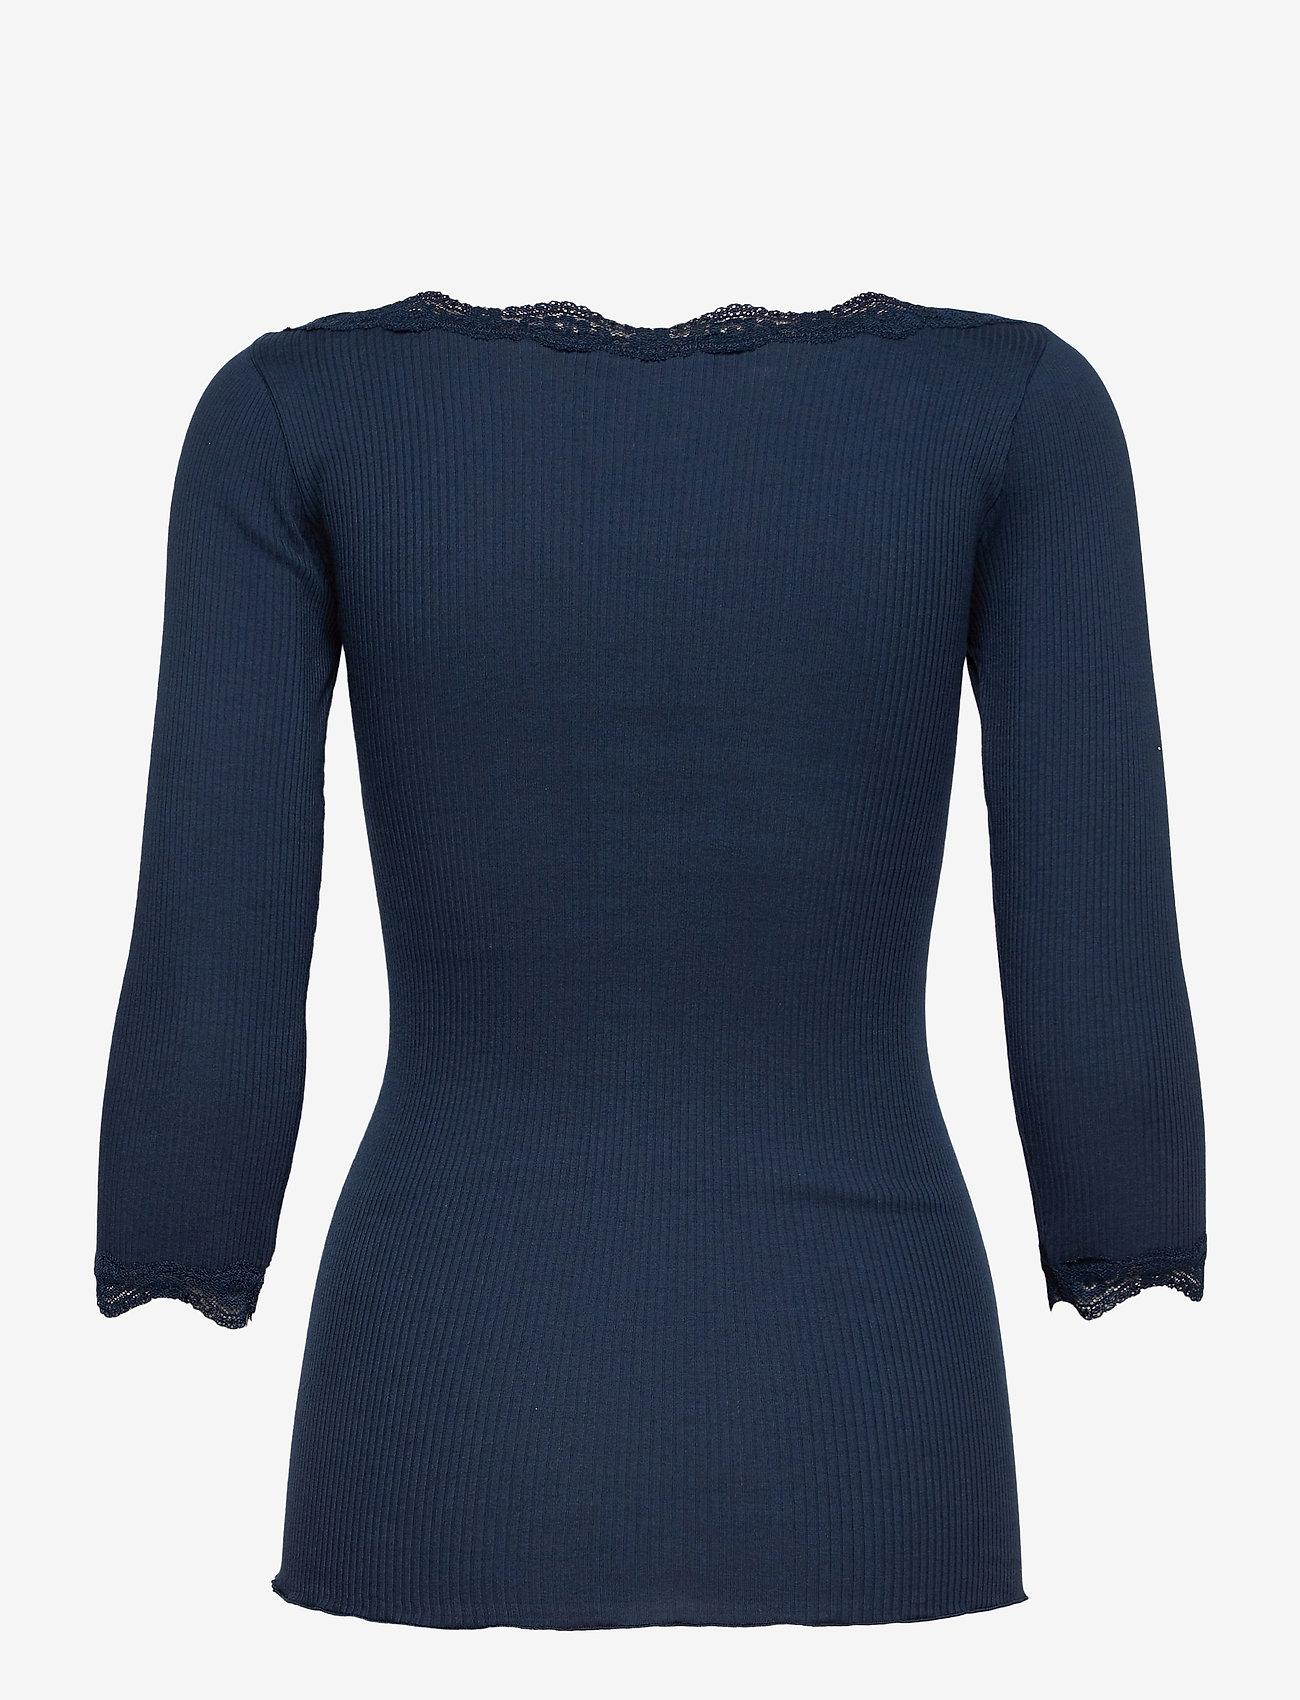 Rosemunde - Organic t-shirt boat neck w/lace - långärmade toppar - navy - 1